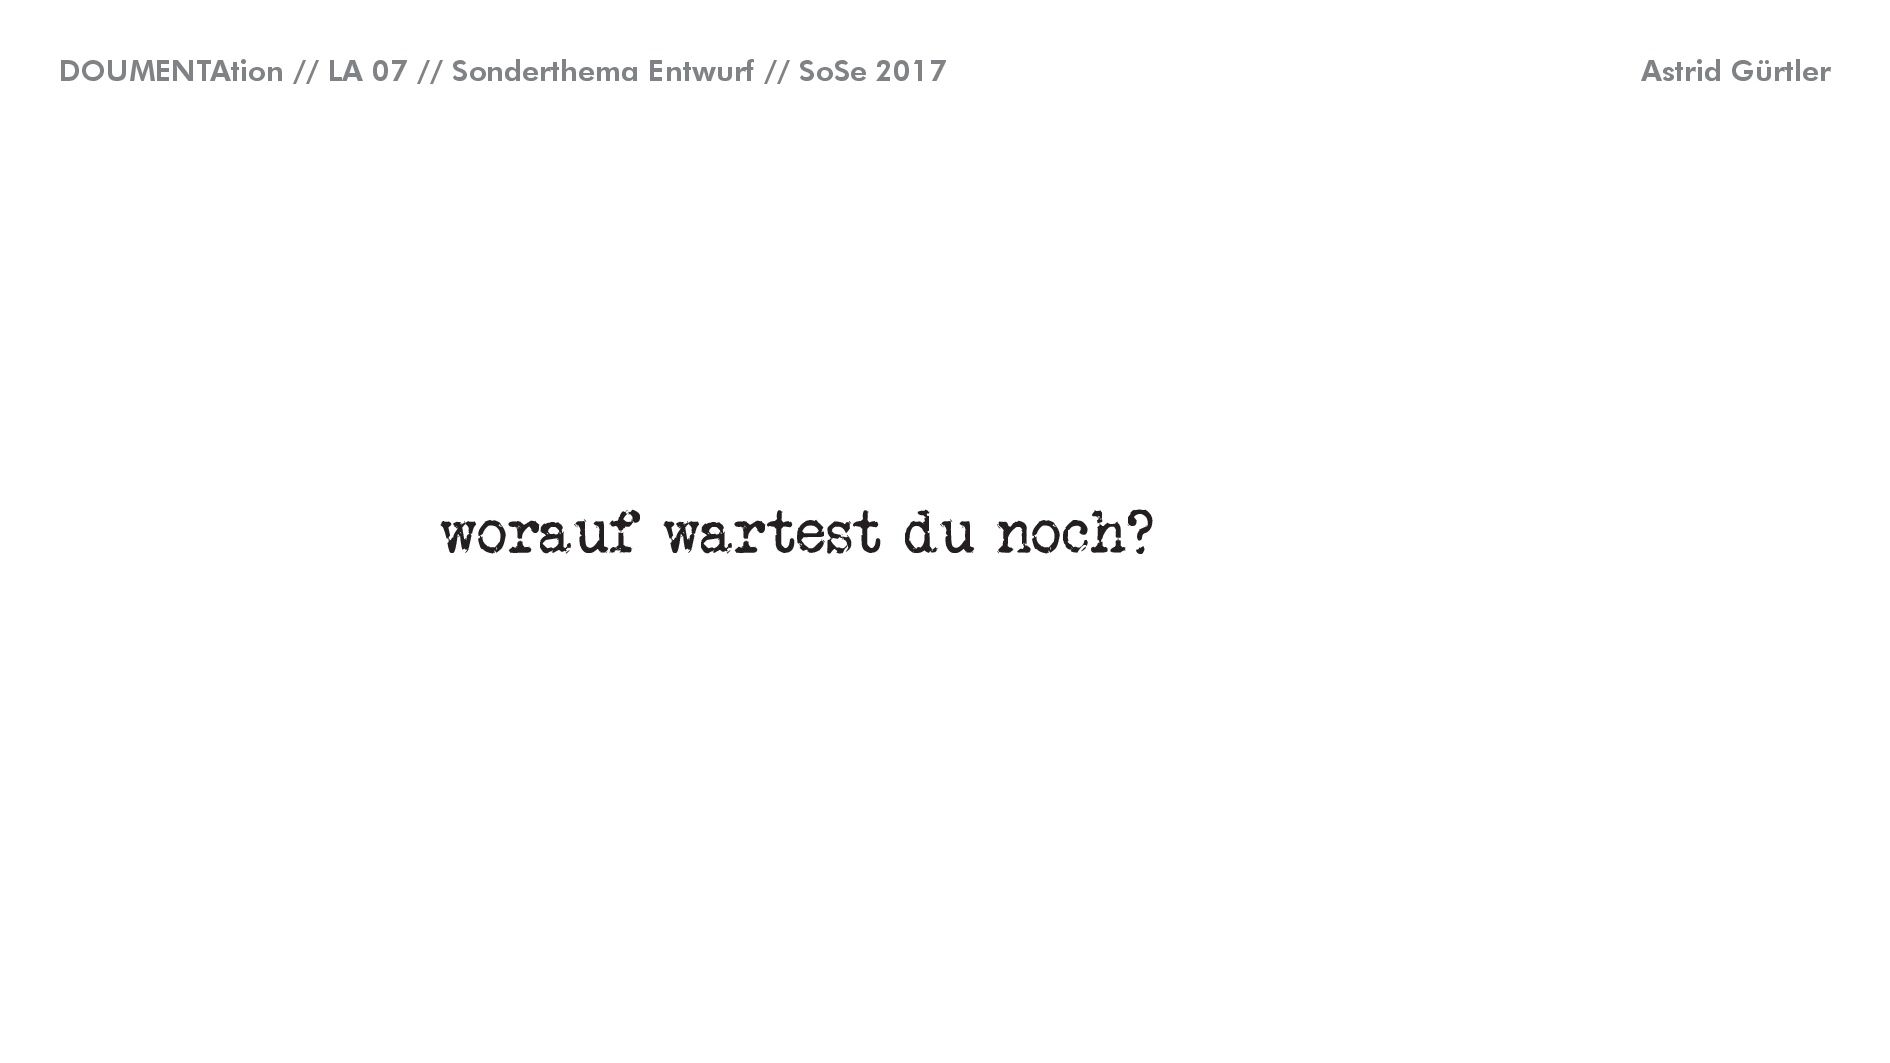 NEU Sonderthema Entwerfen SoSe 17 022